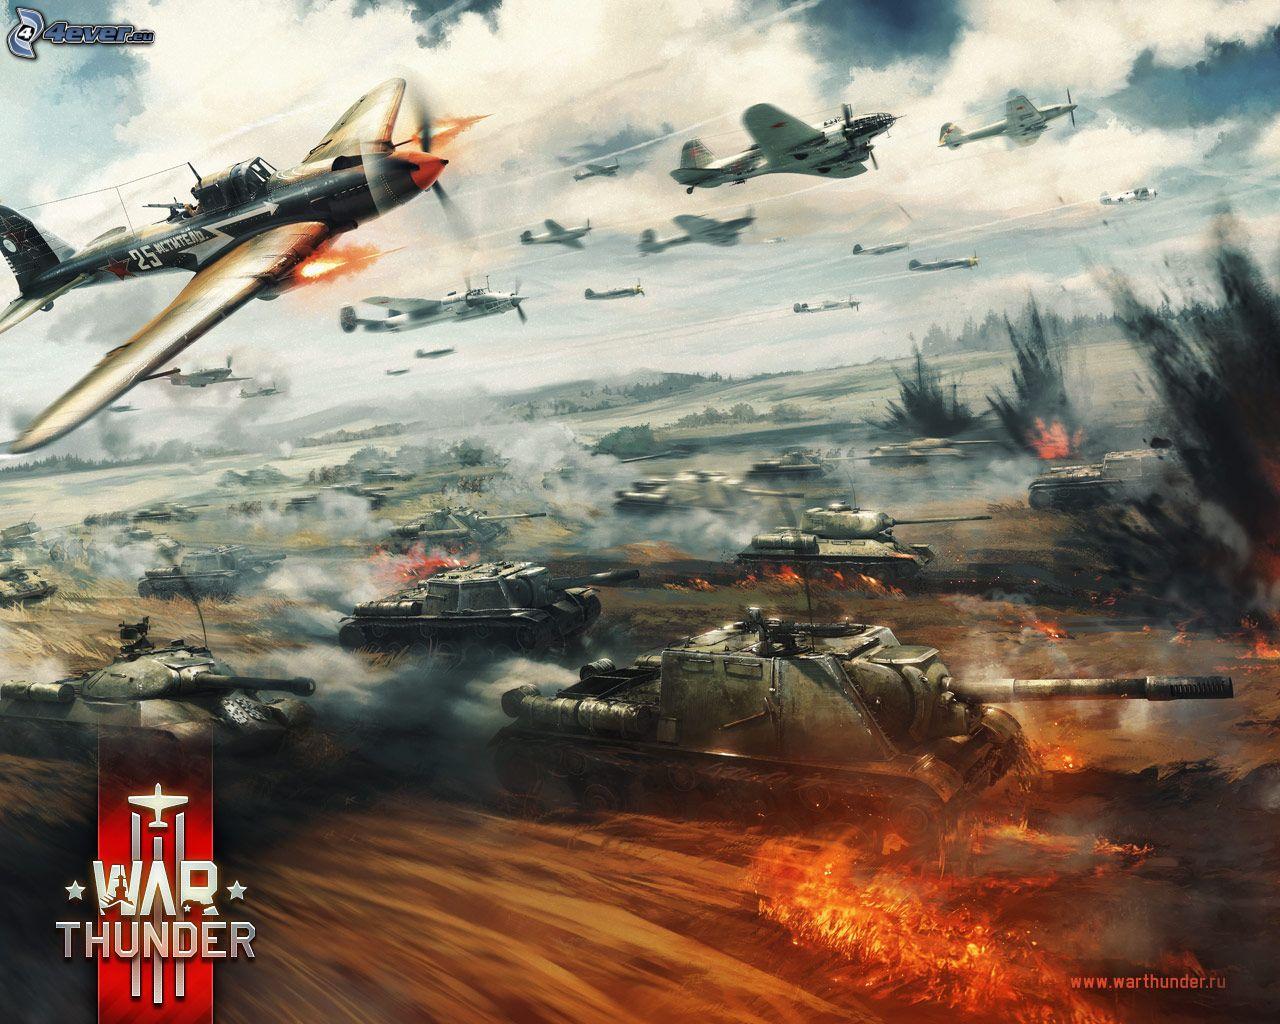 War Thunder for Android - APK Download - APKPure.com